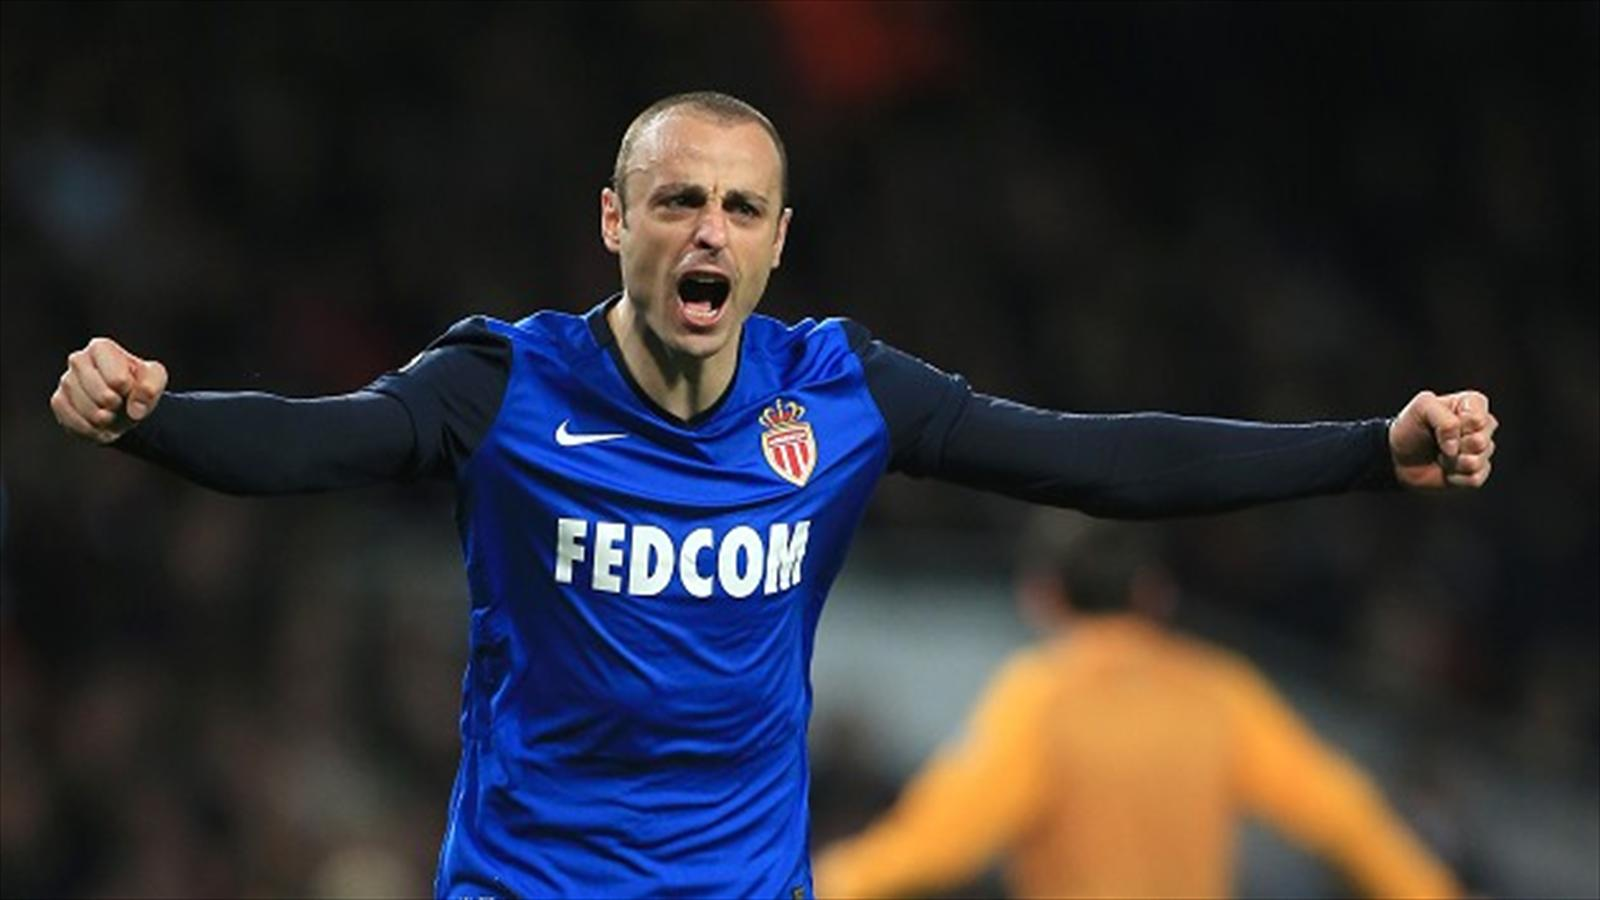 Dimitar Berbatov Monaco wanted it more than Arsenal Champions